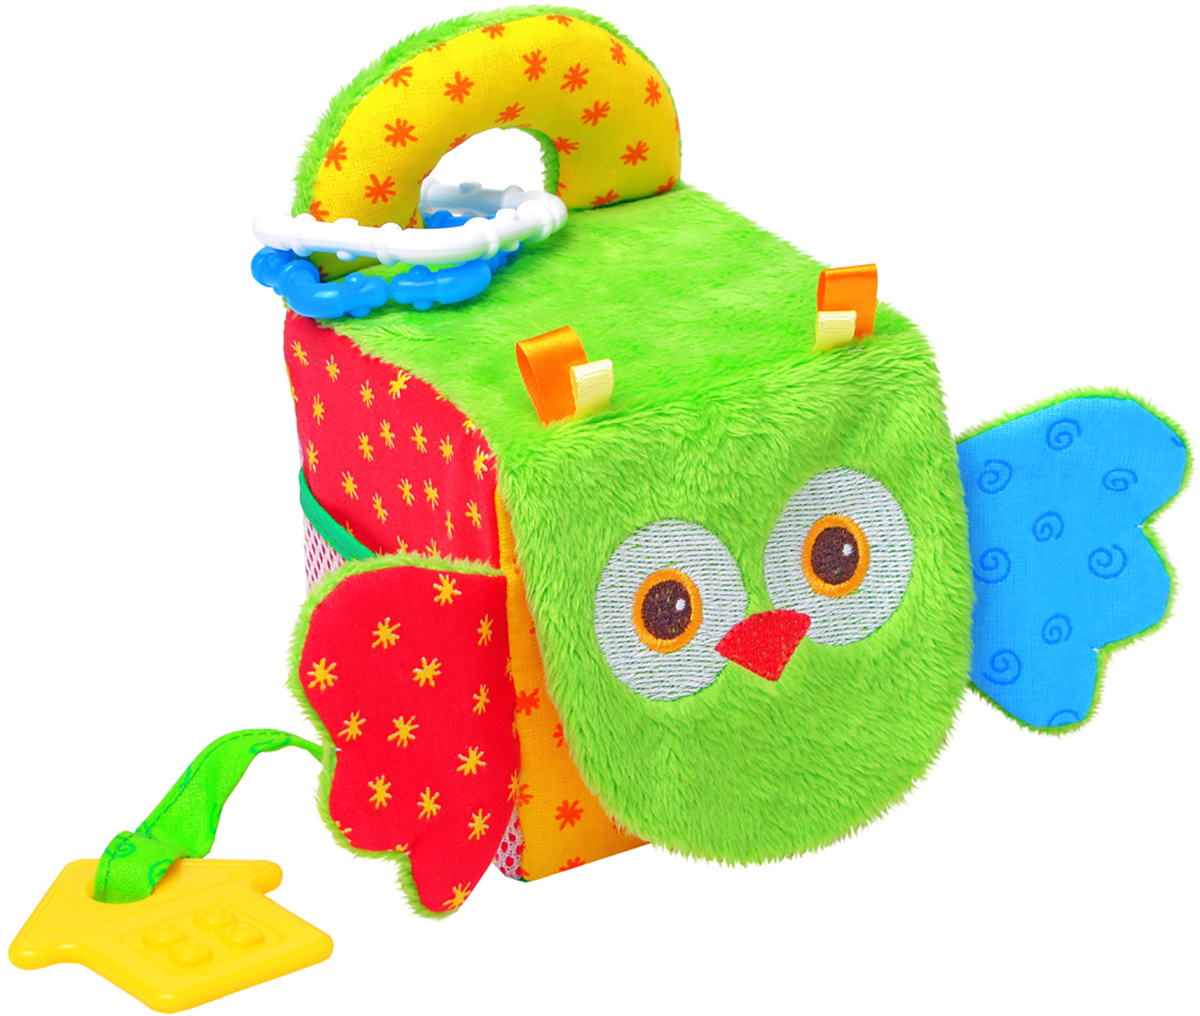 Мякиши Развивающая игрушка Кубик сова игрушка погремушка мякиши медвежонок колечко